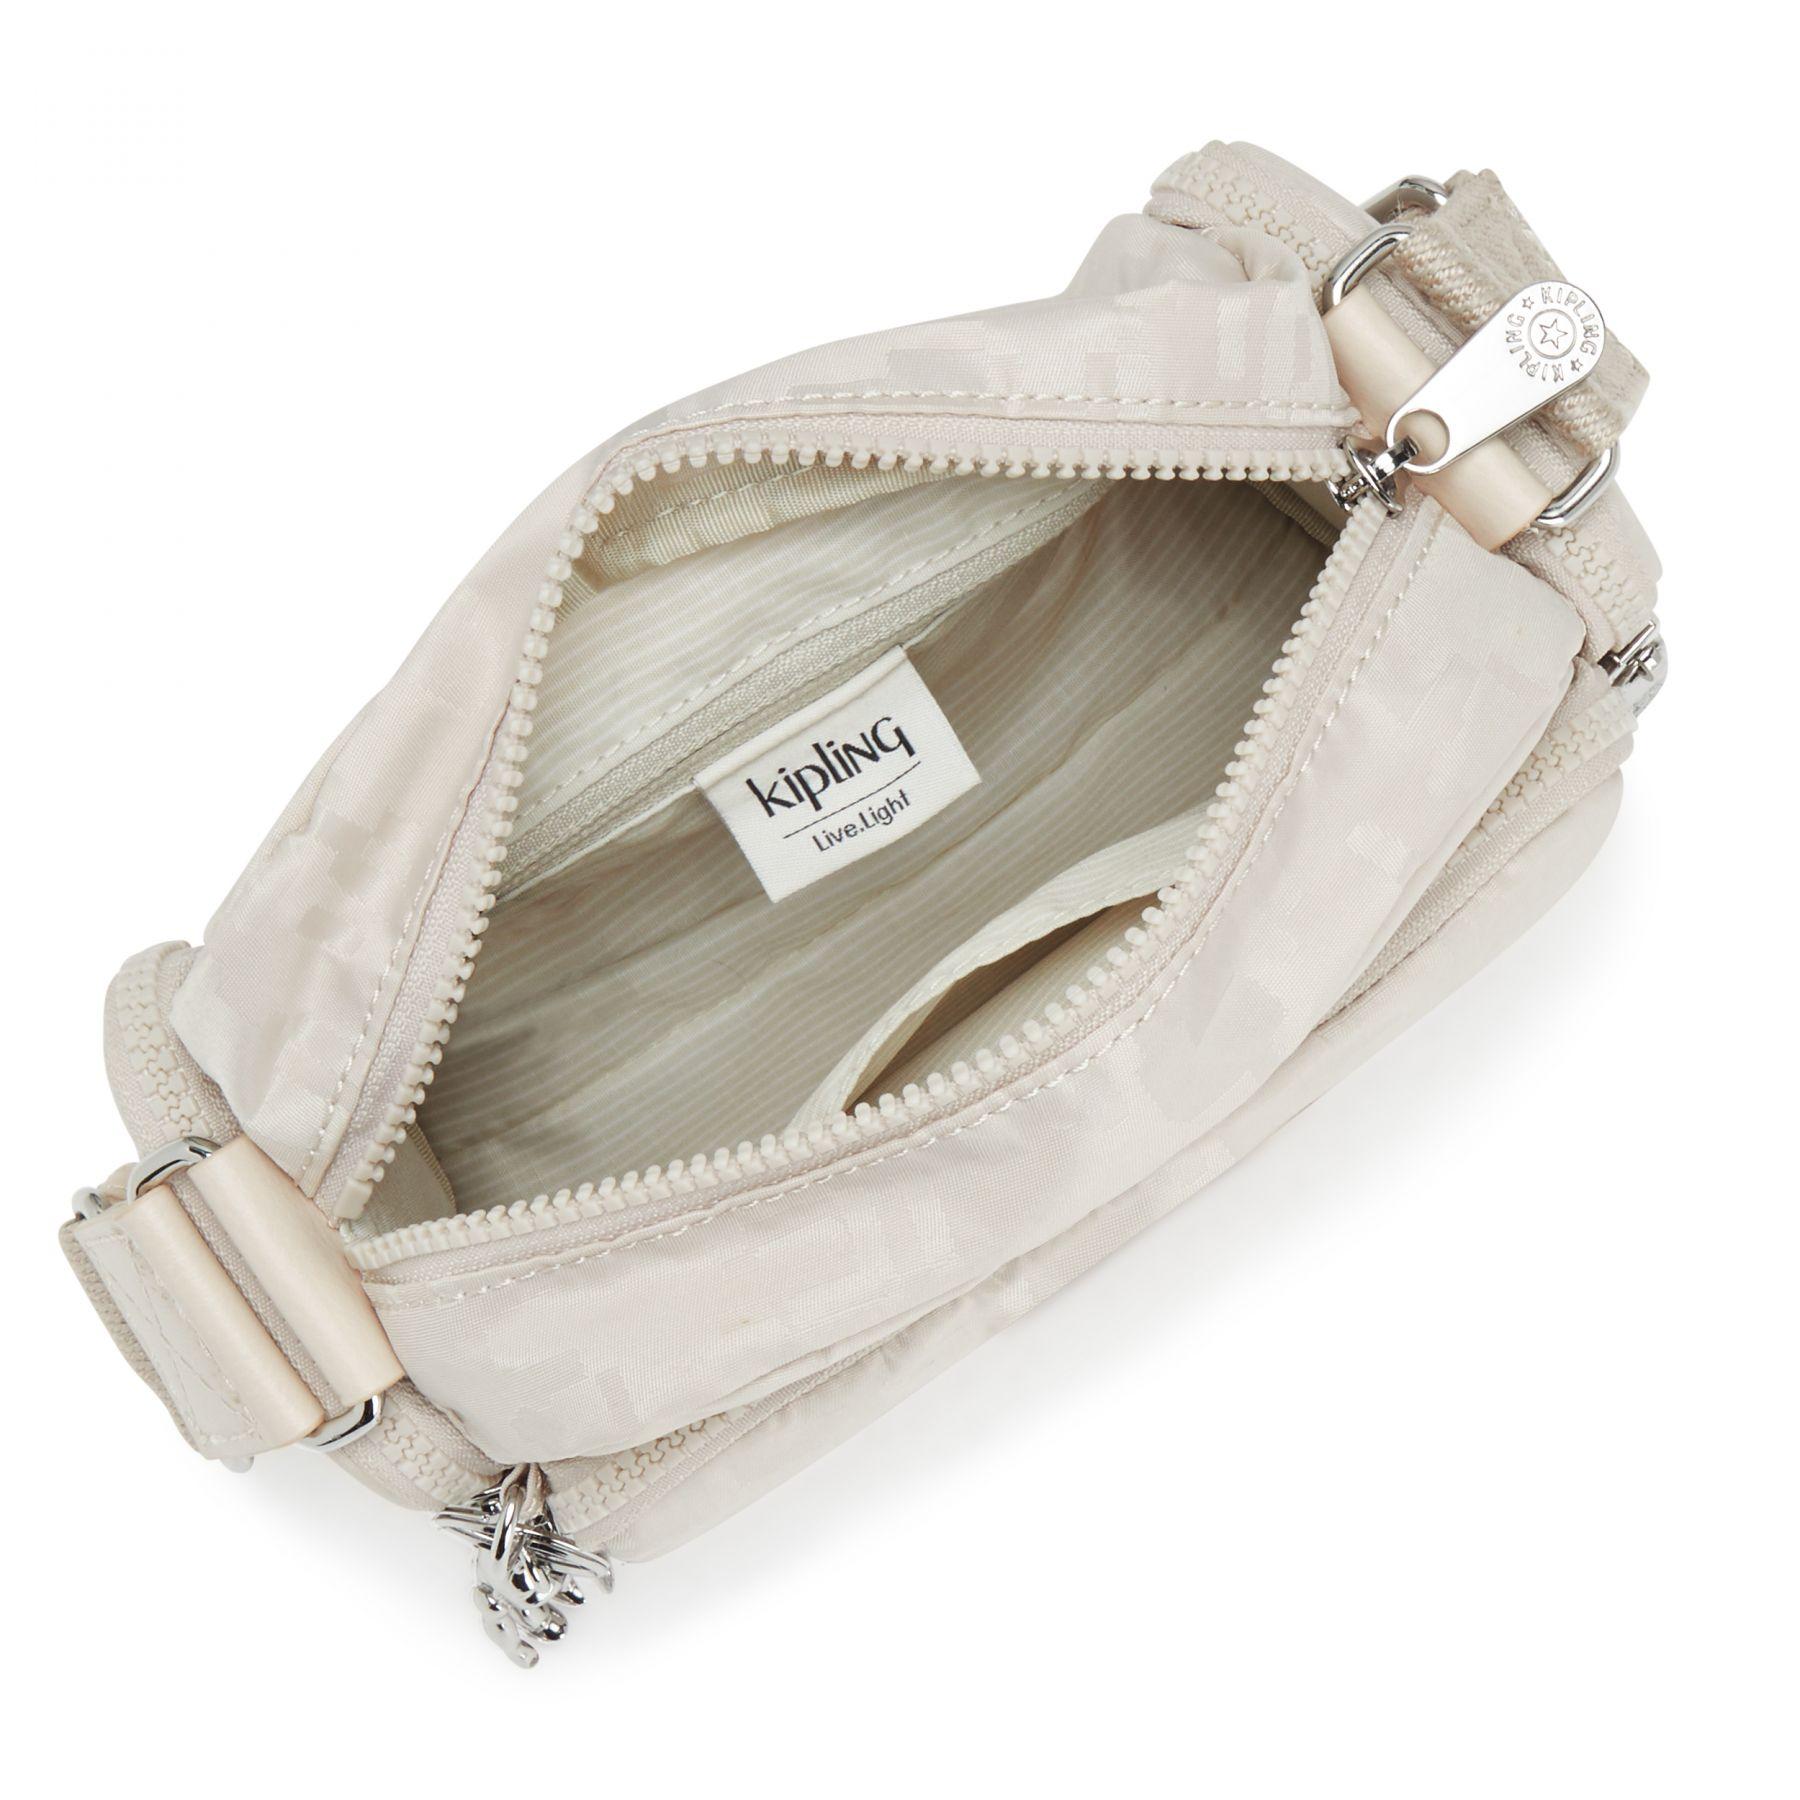 JENERA MINI BAGS by Kipling